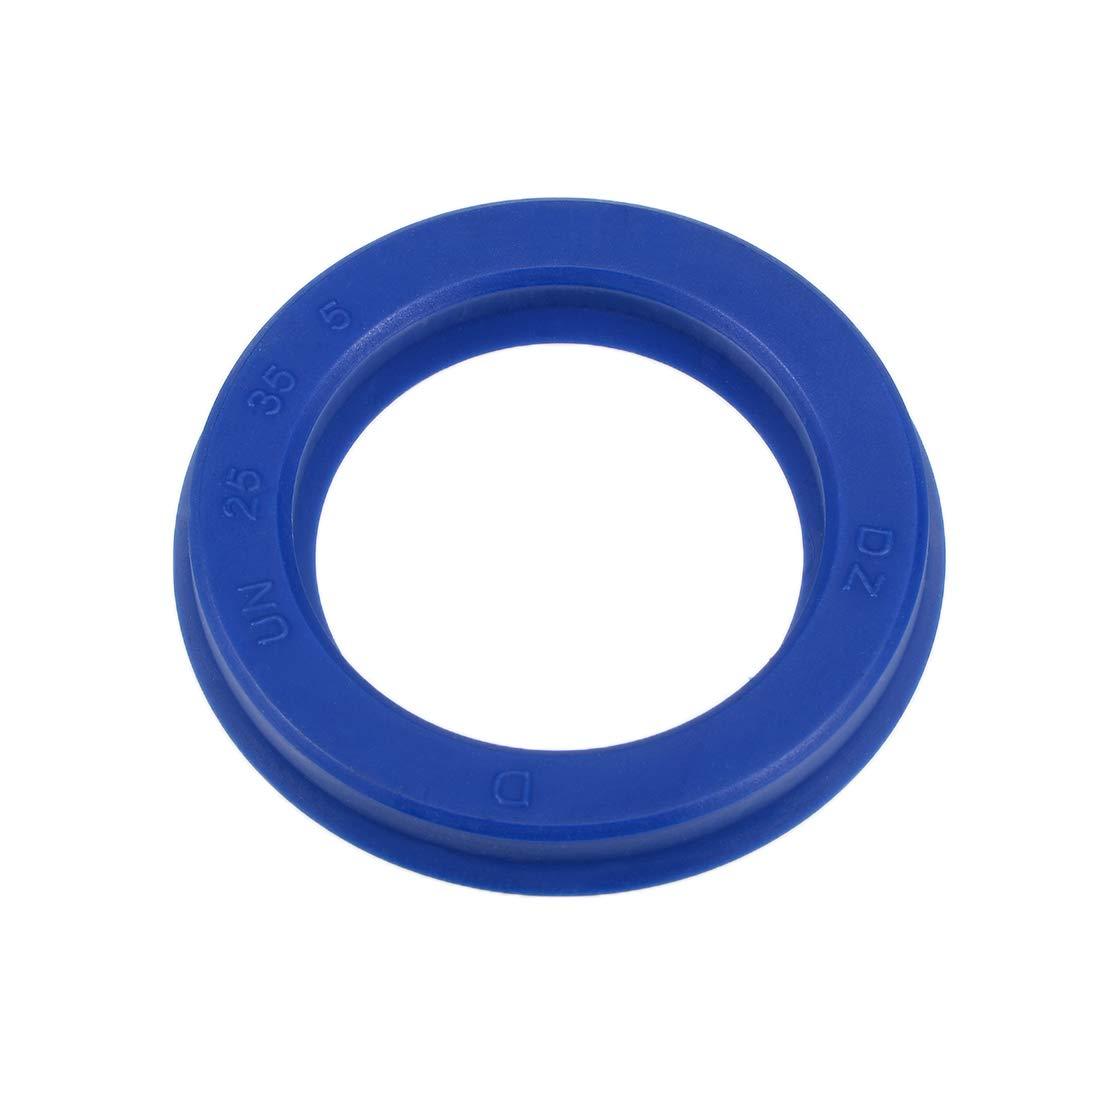 Piston Shaft U32i PU Oil Sealing O-Ring 35mm x 43mm x 6mm uxcell Hydraulic Seal